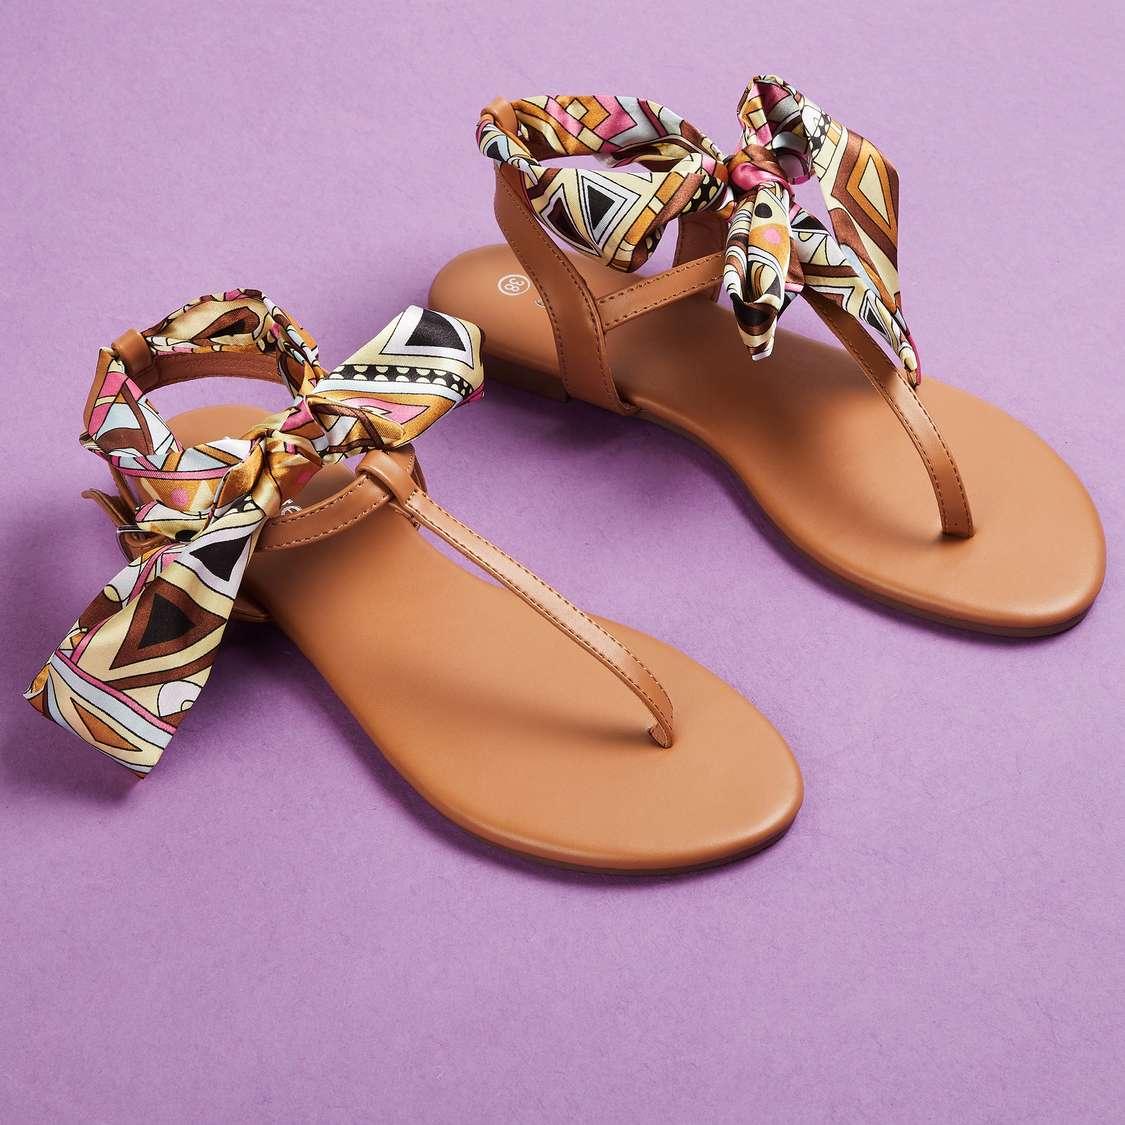 GINGER Footwear Women Printed Tie-Up Flats